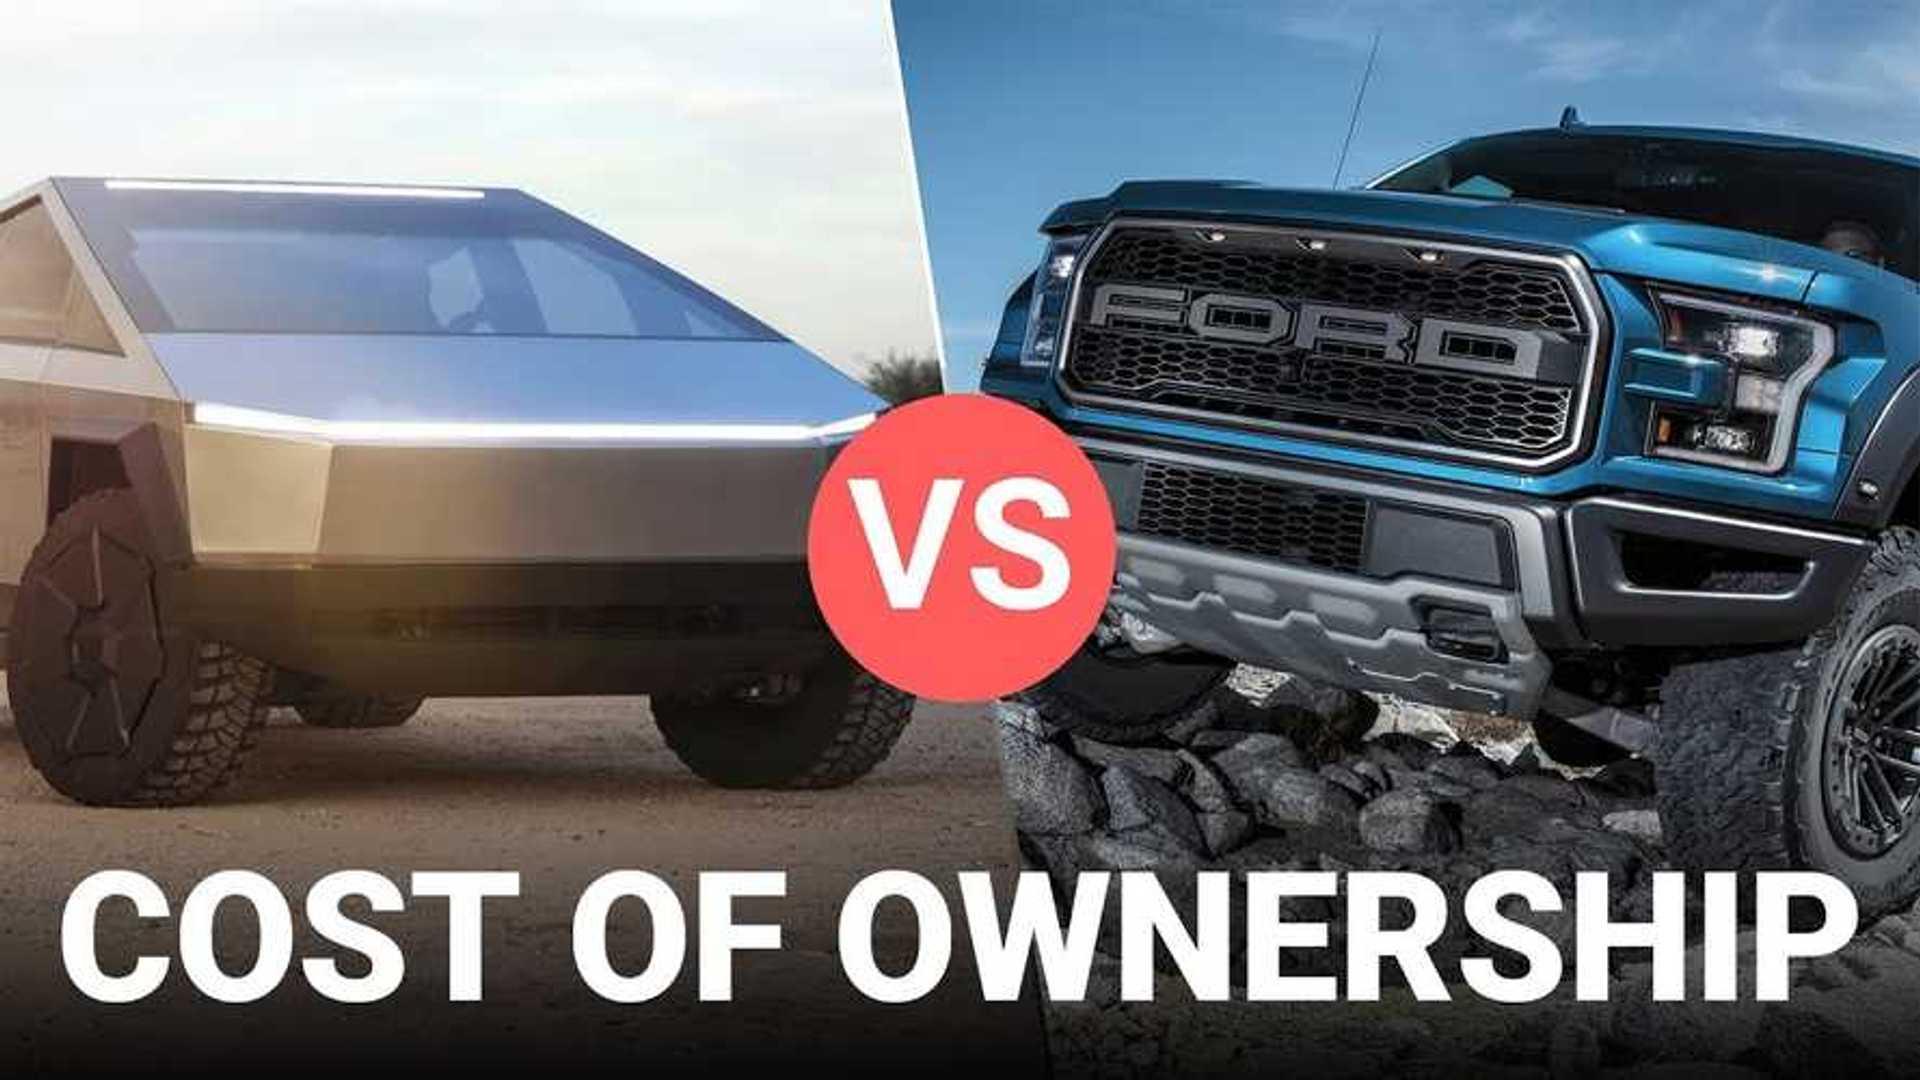 Cost Analysis: Tesla Cybertruck Vs Ford F-150 Pickup Truck